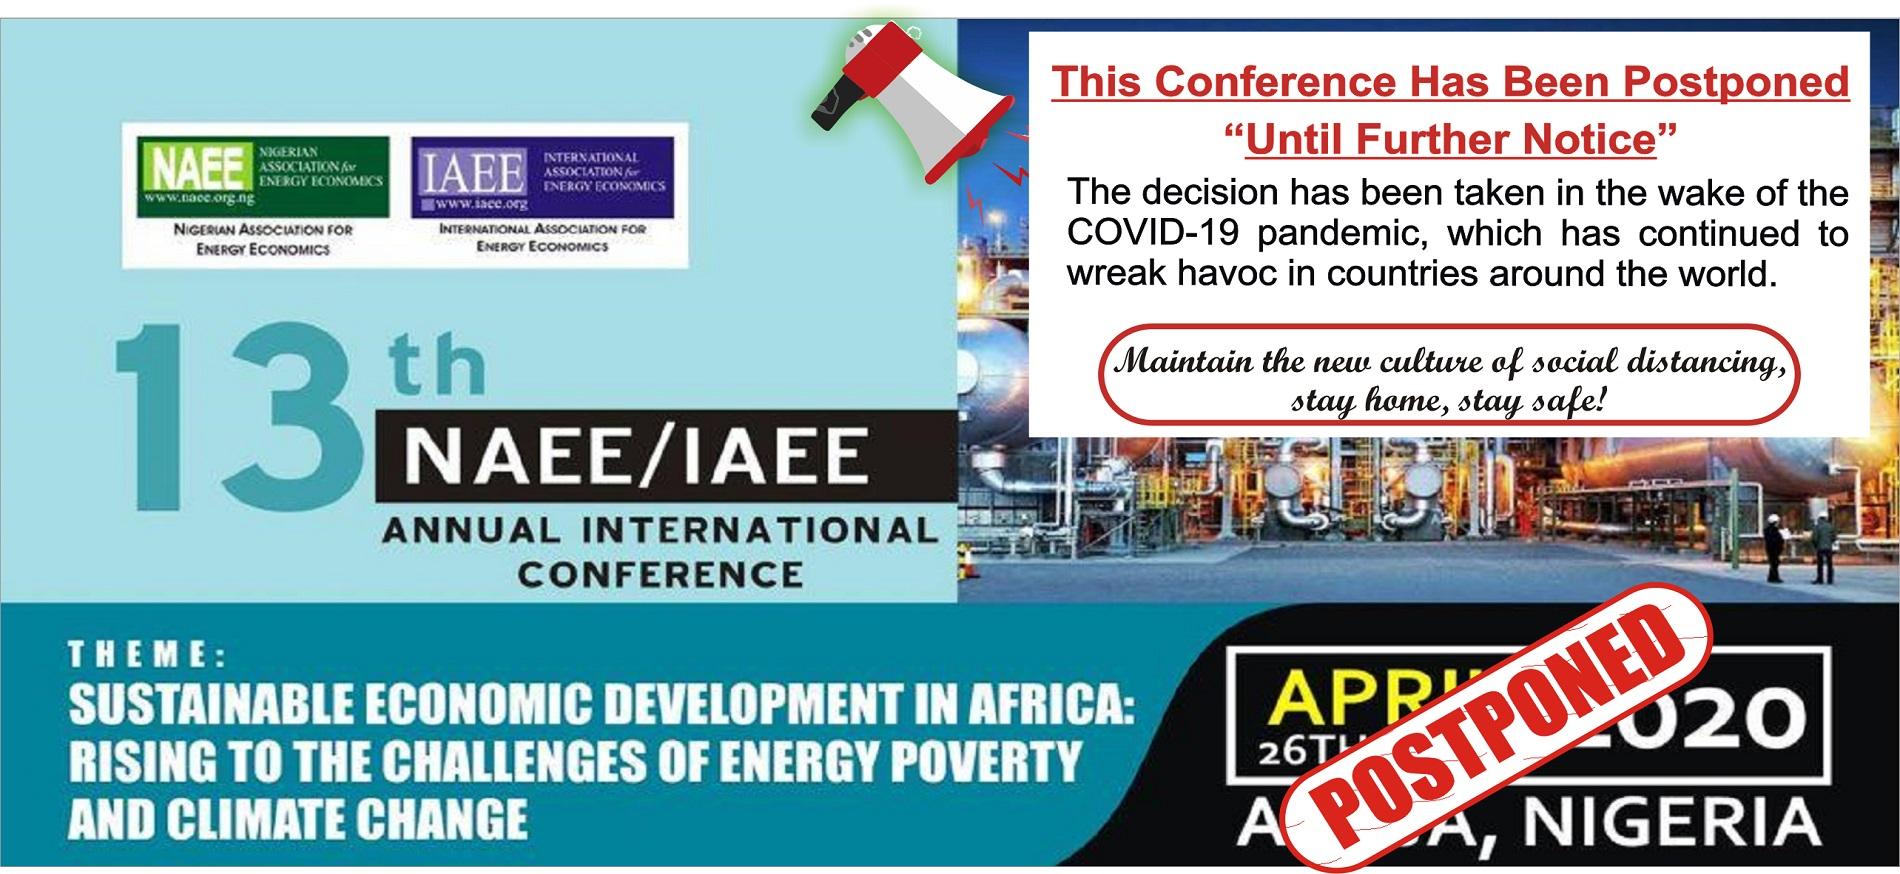 IAEE/NAEE 2020